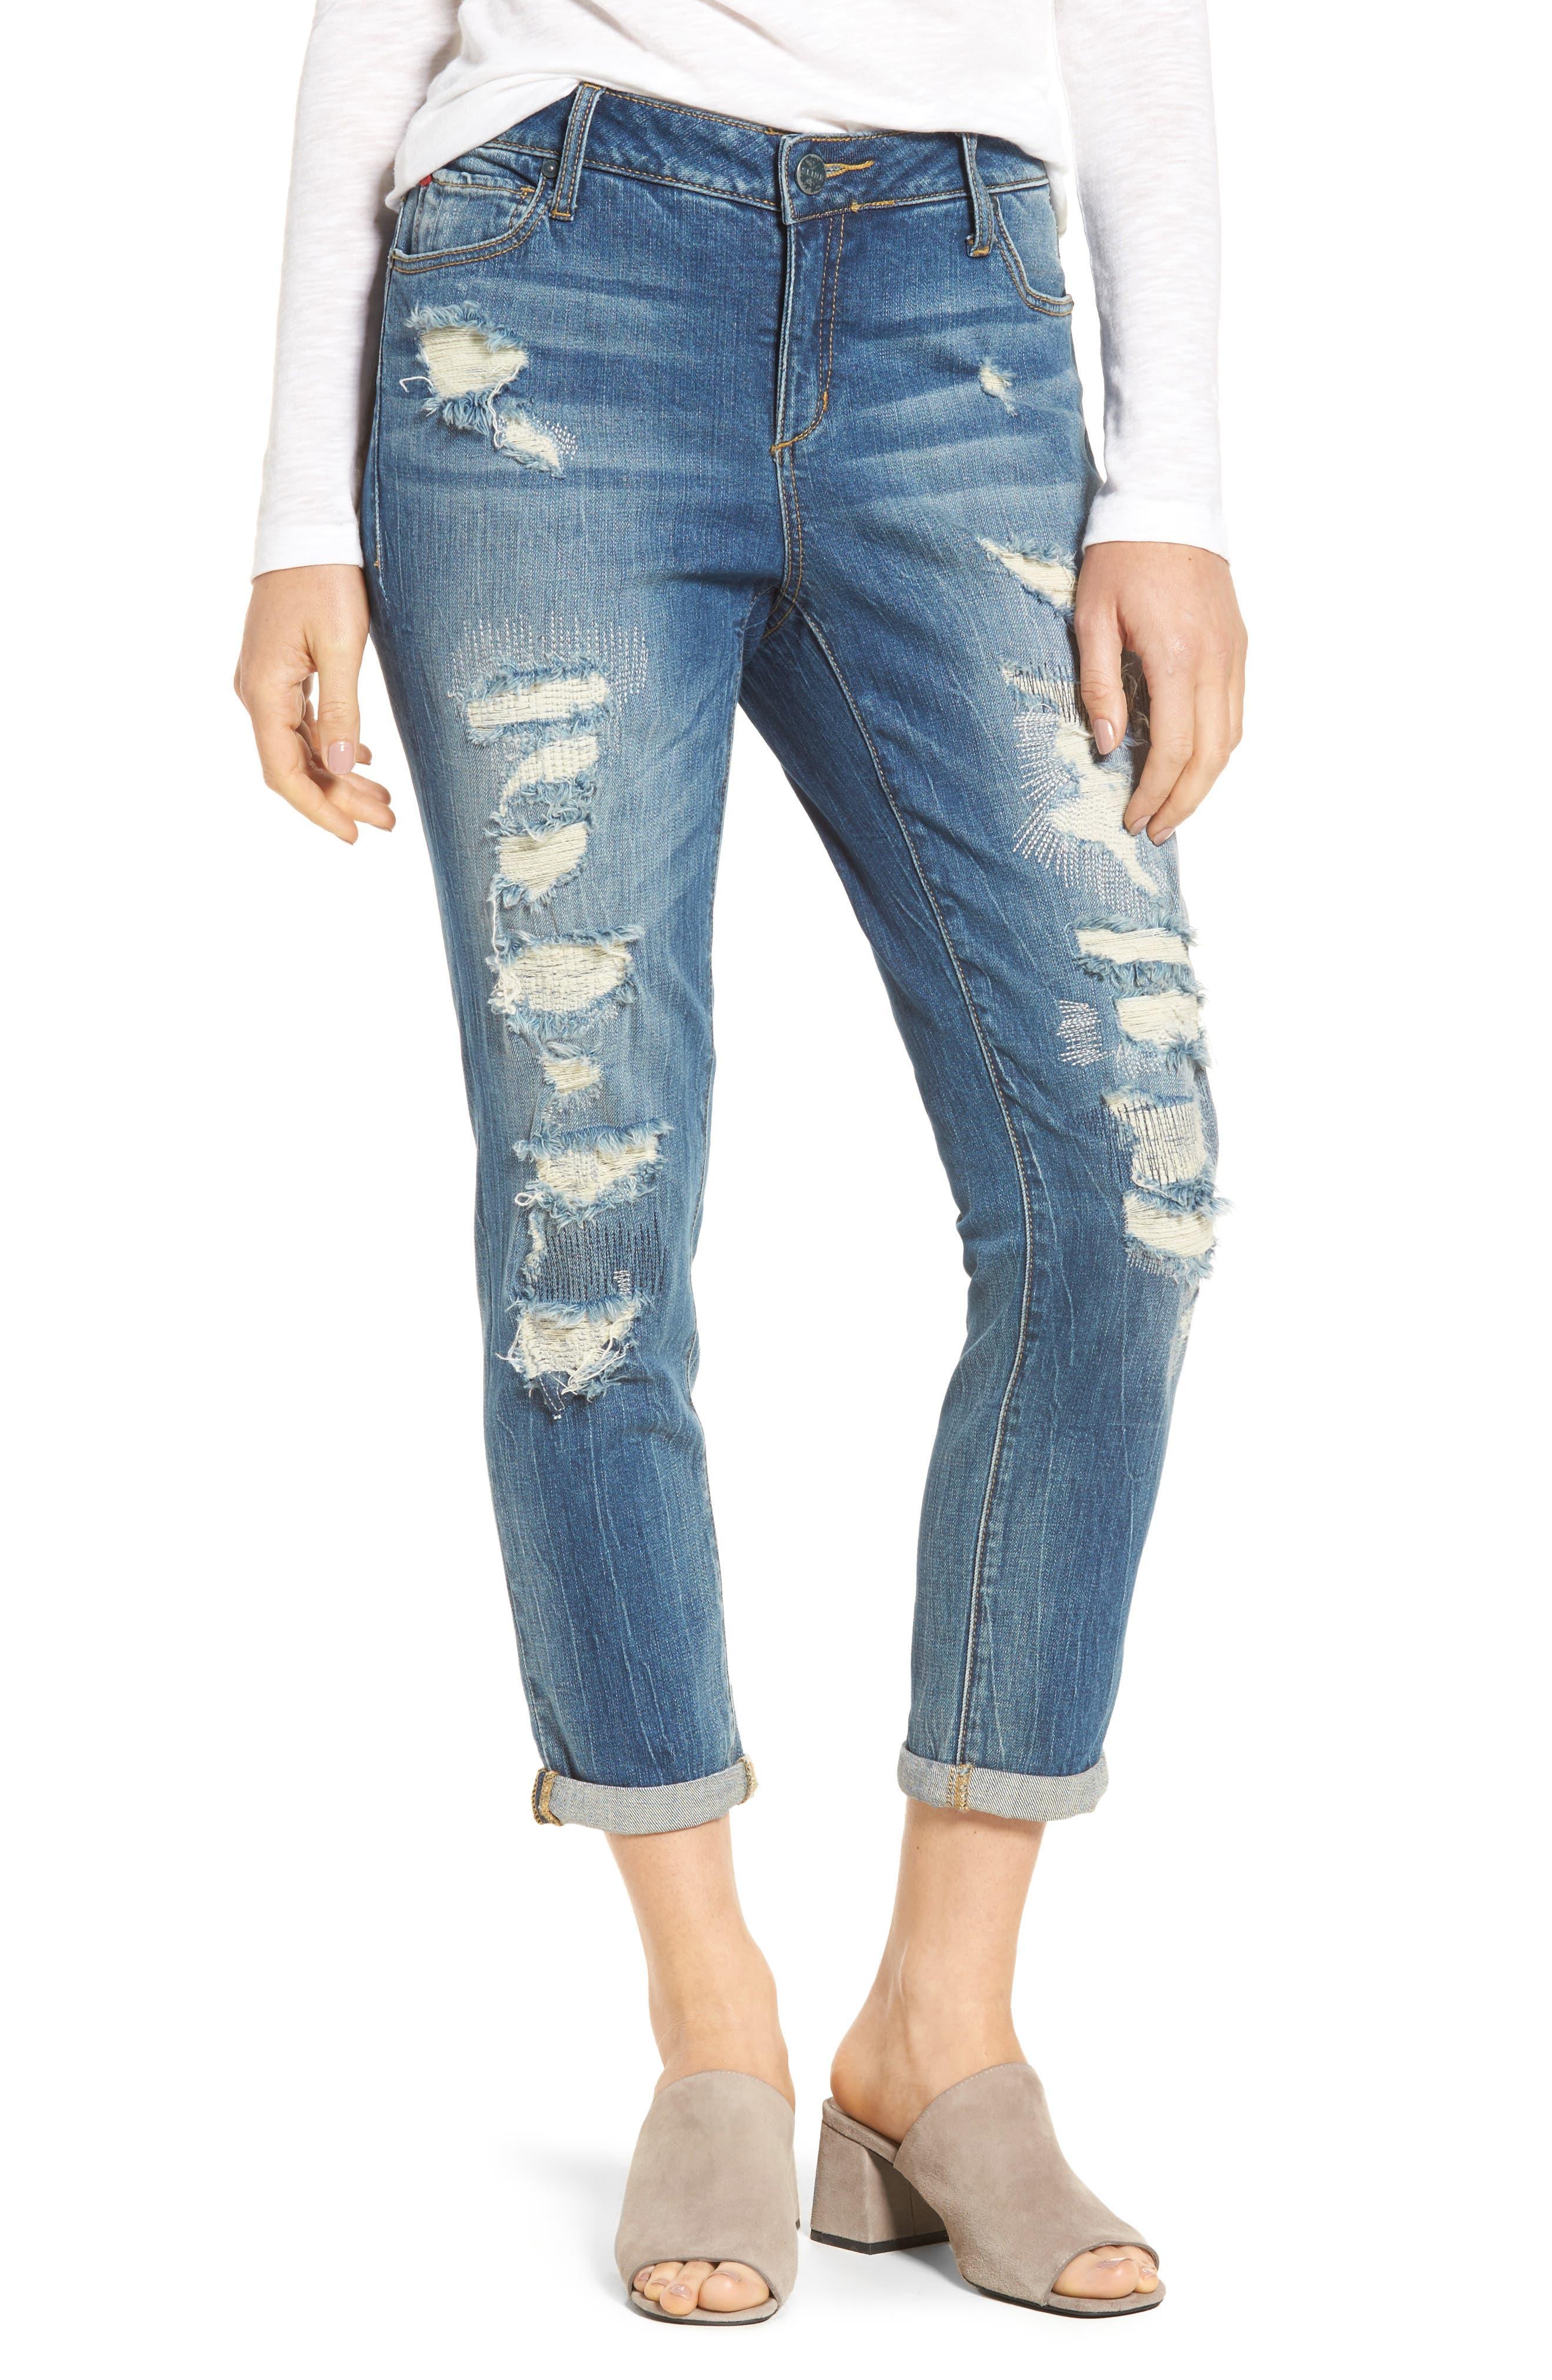 SLINK JEANS Distressed Ankle Boyfriend Jeans, Main, color, 456